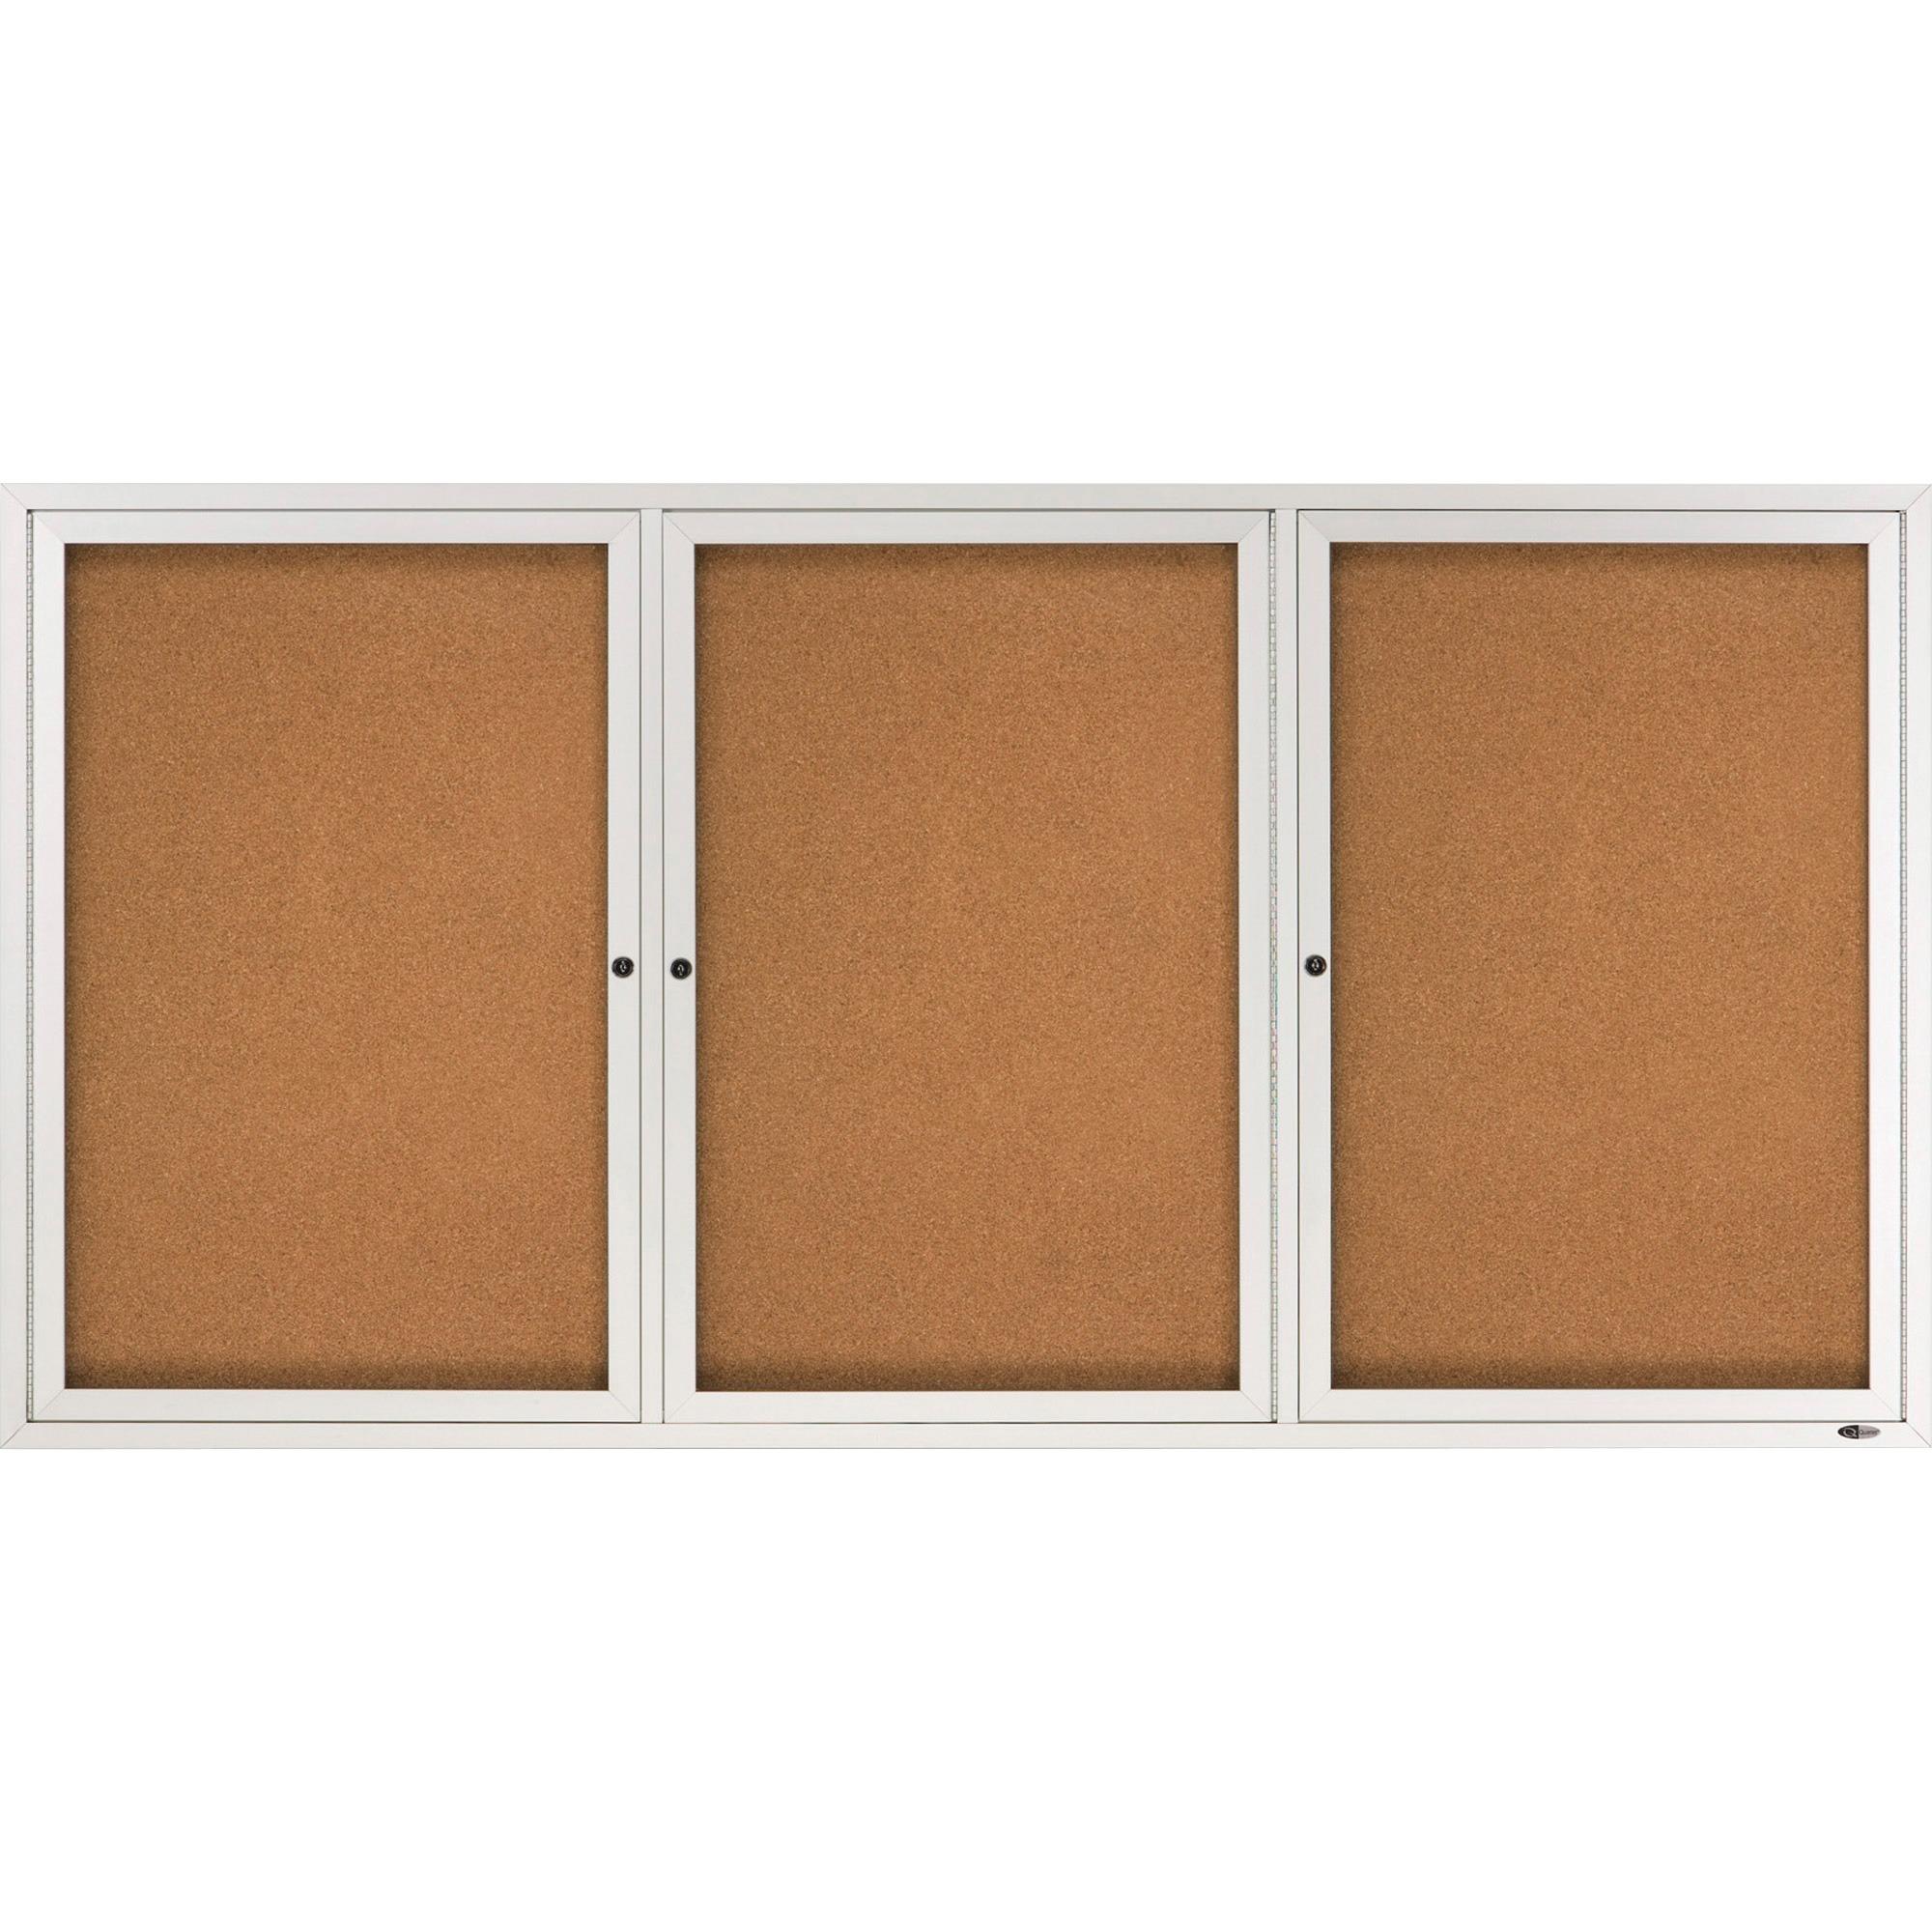 Acco Brands Corporation Quartet® Enclosed Cork Bulletin Board For Indoor Use, 6 X 3, 3 Door, Aluminum Frame - 36 Height X 72 Width - Natural Cork Surface - Aluminum Frame - 1 / Each